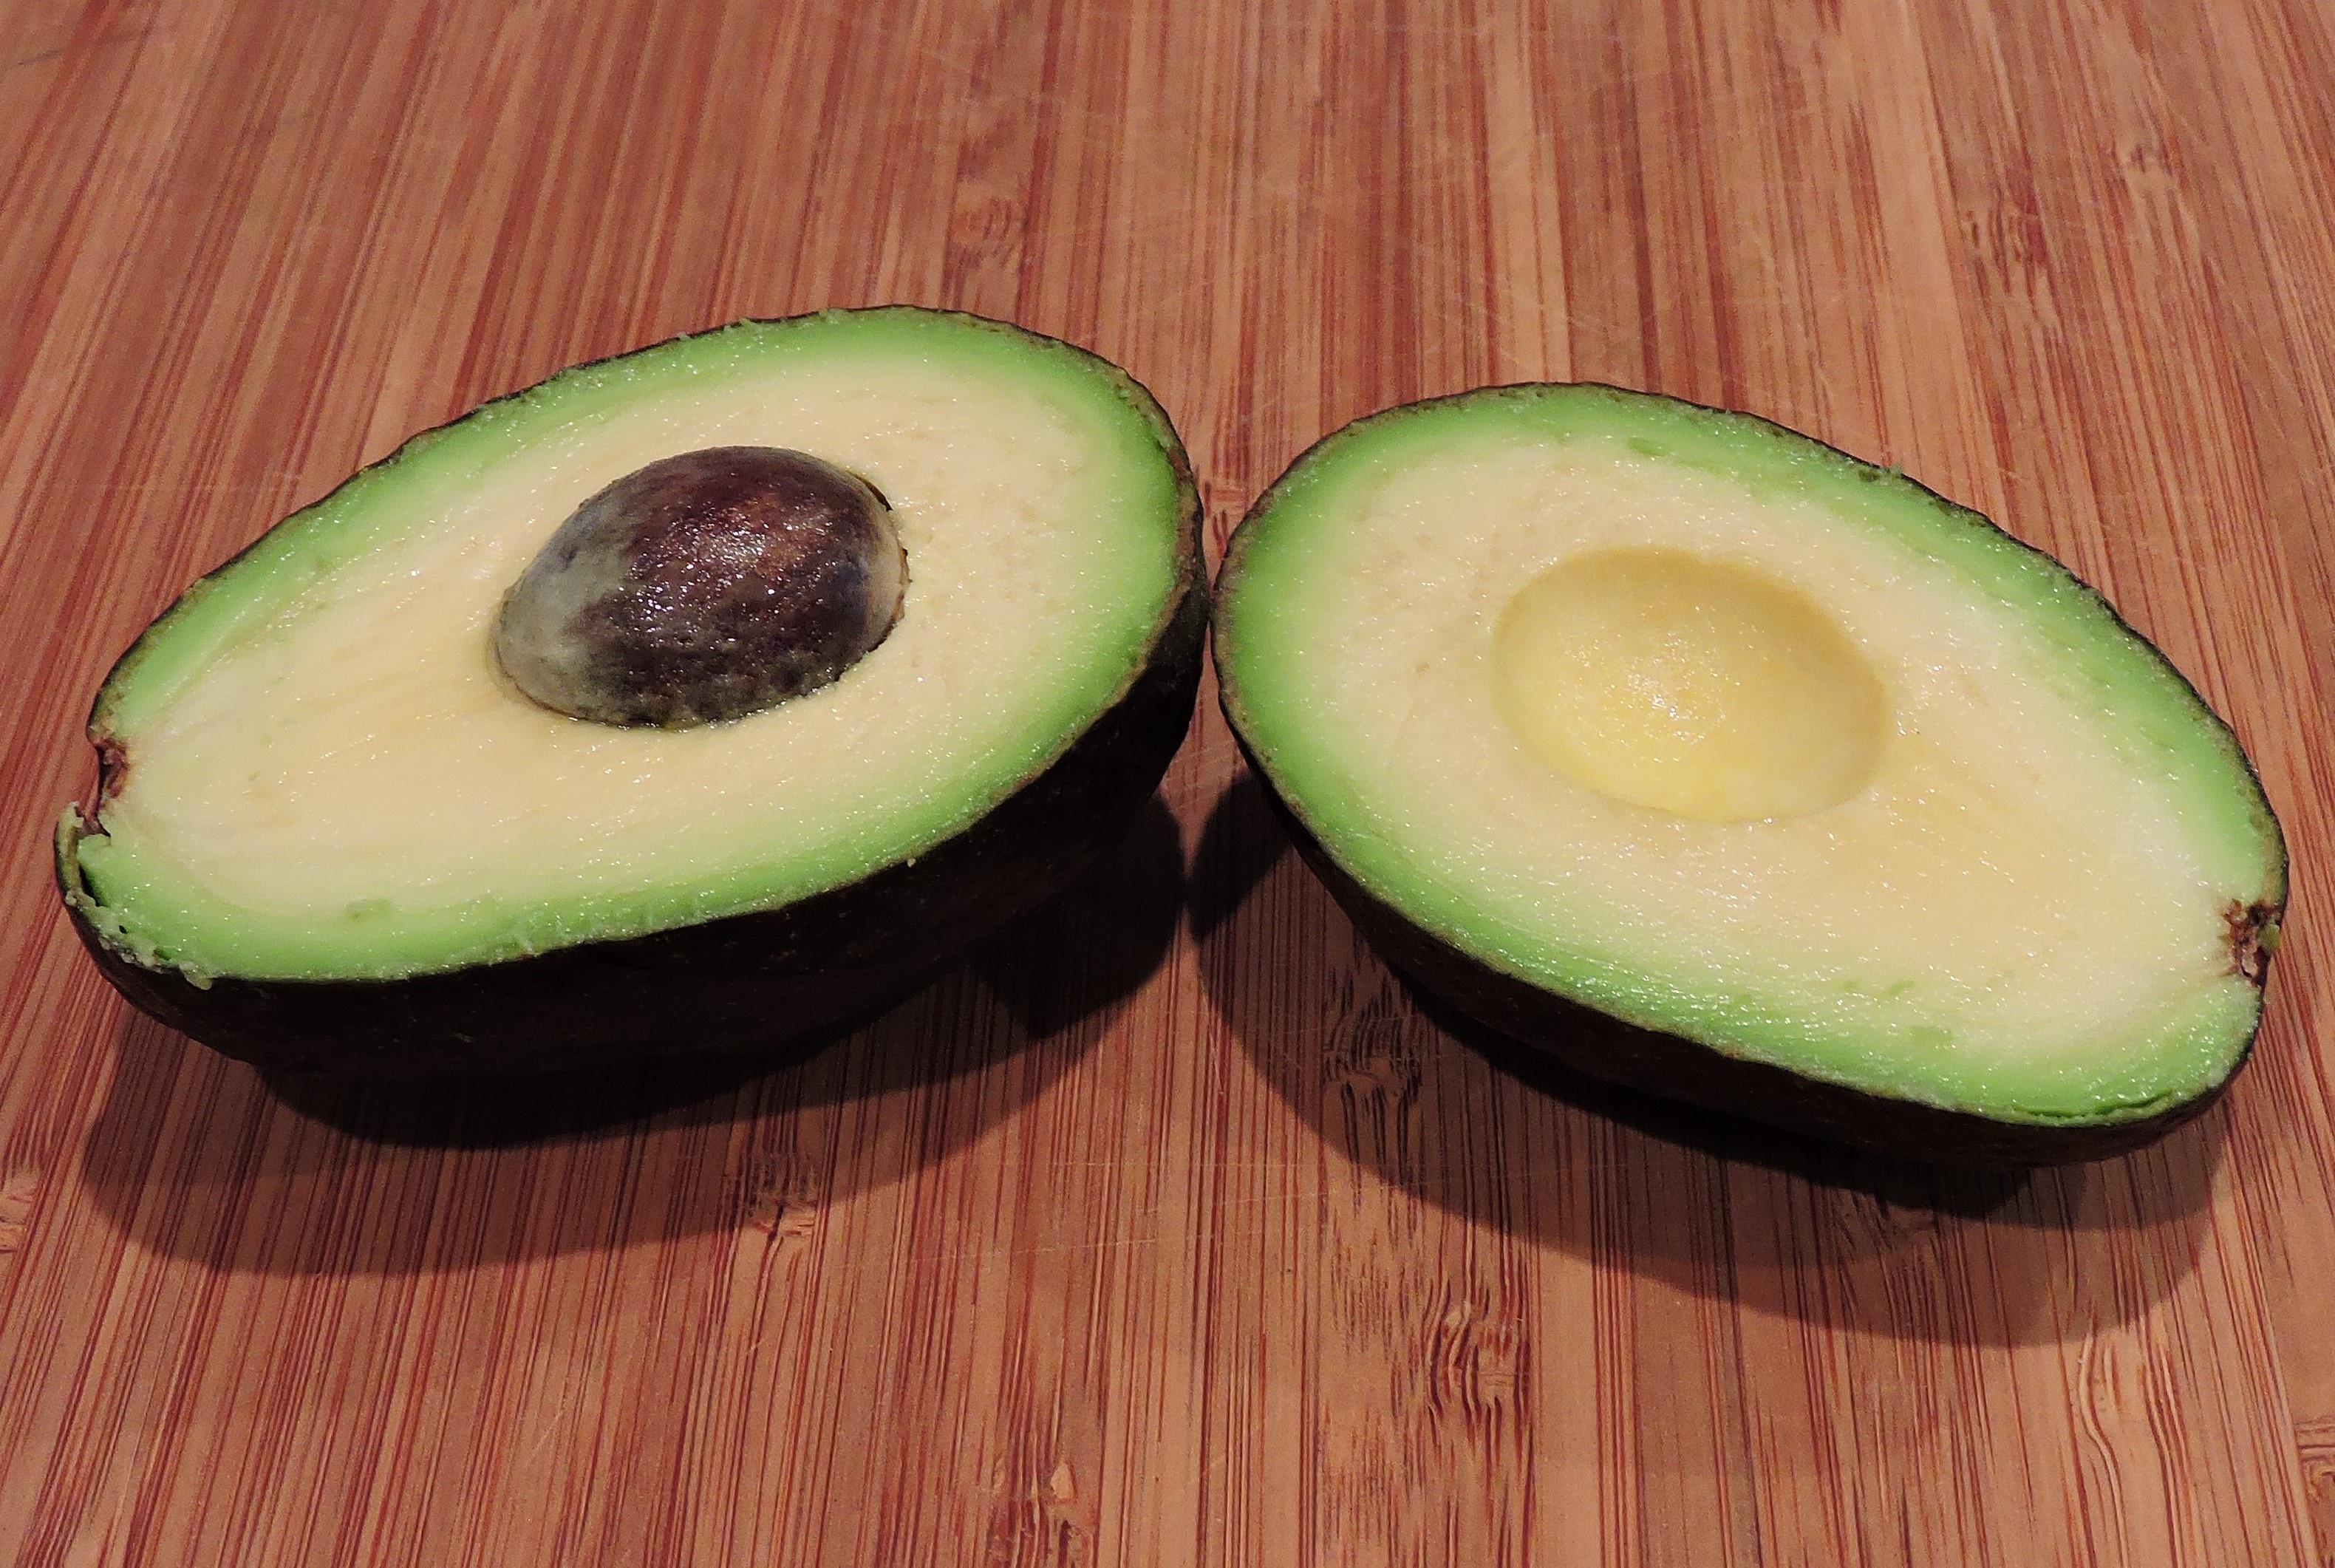 menanam buah benih makanan hijau menghasilkan segar alpukat sehat kelapa tanaman berbunga bagian tanaman tanah